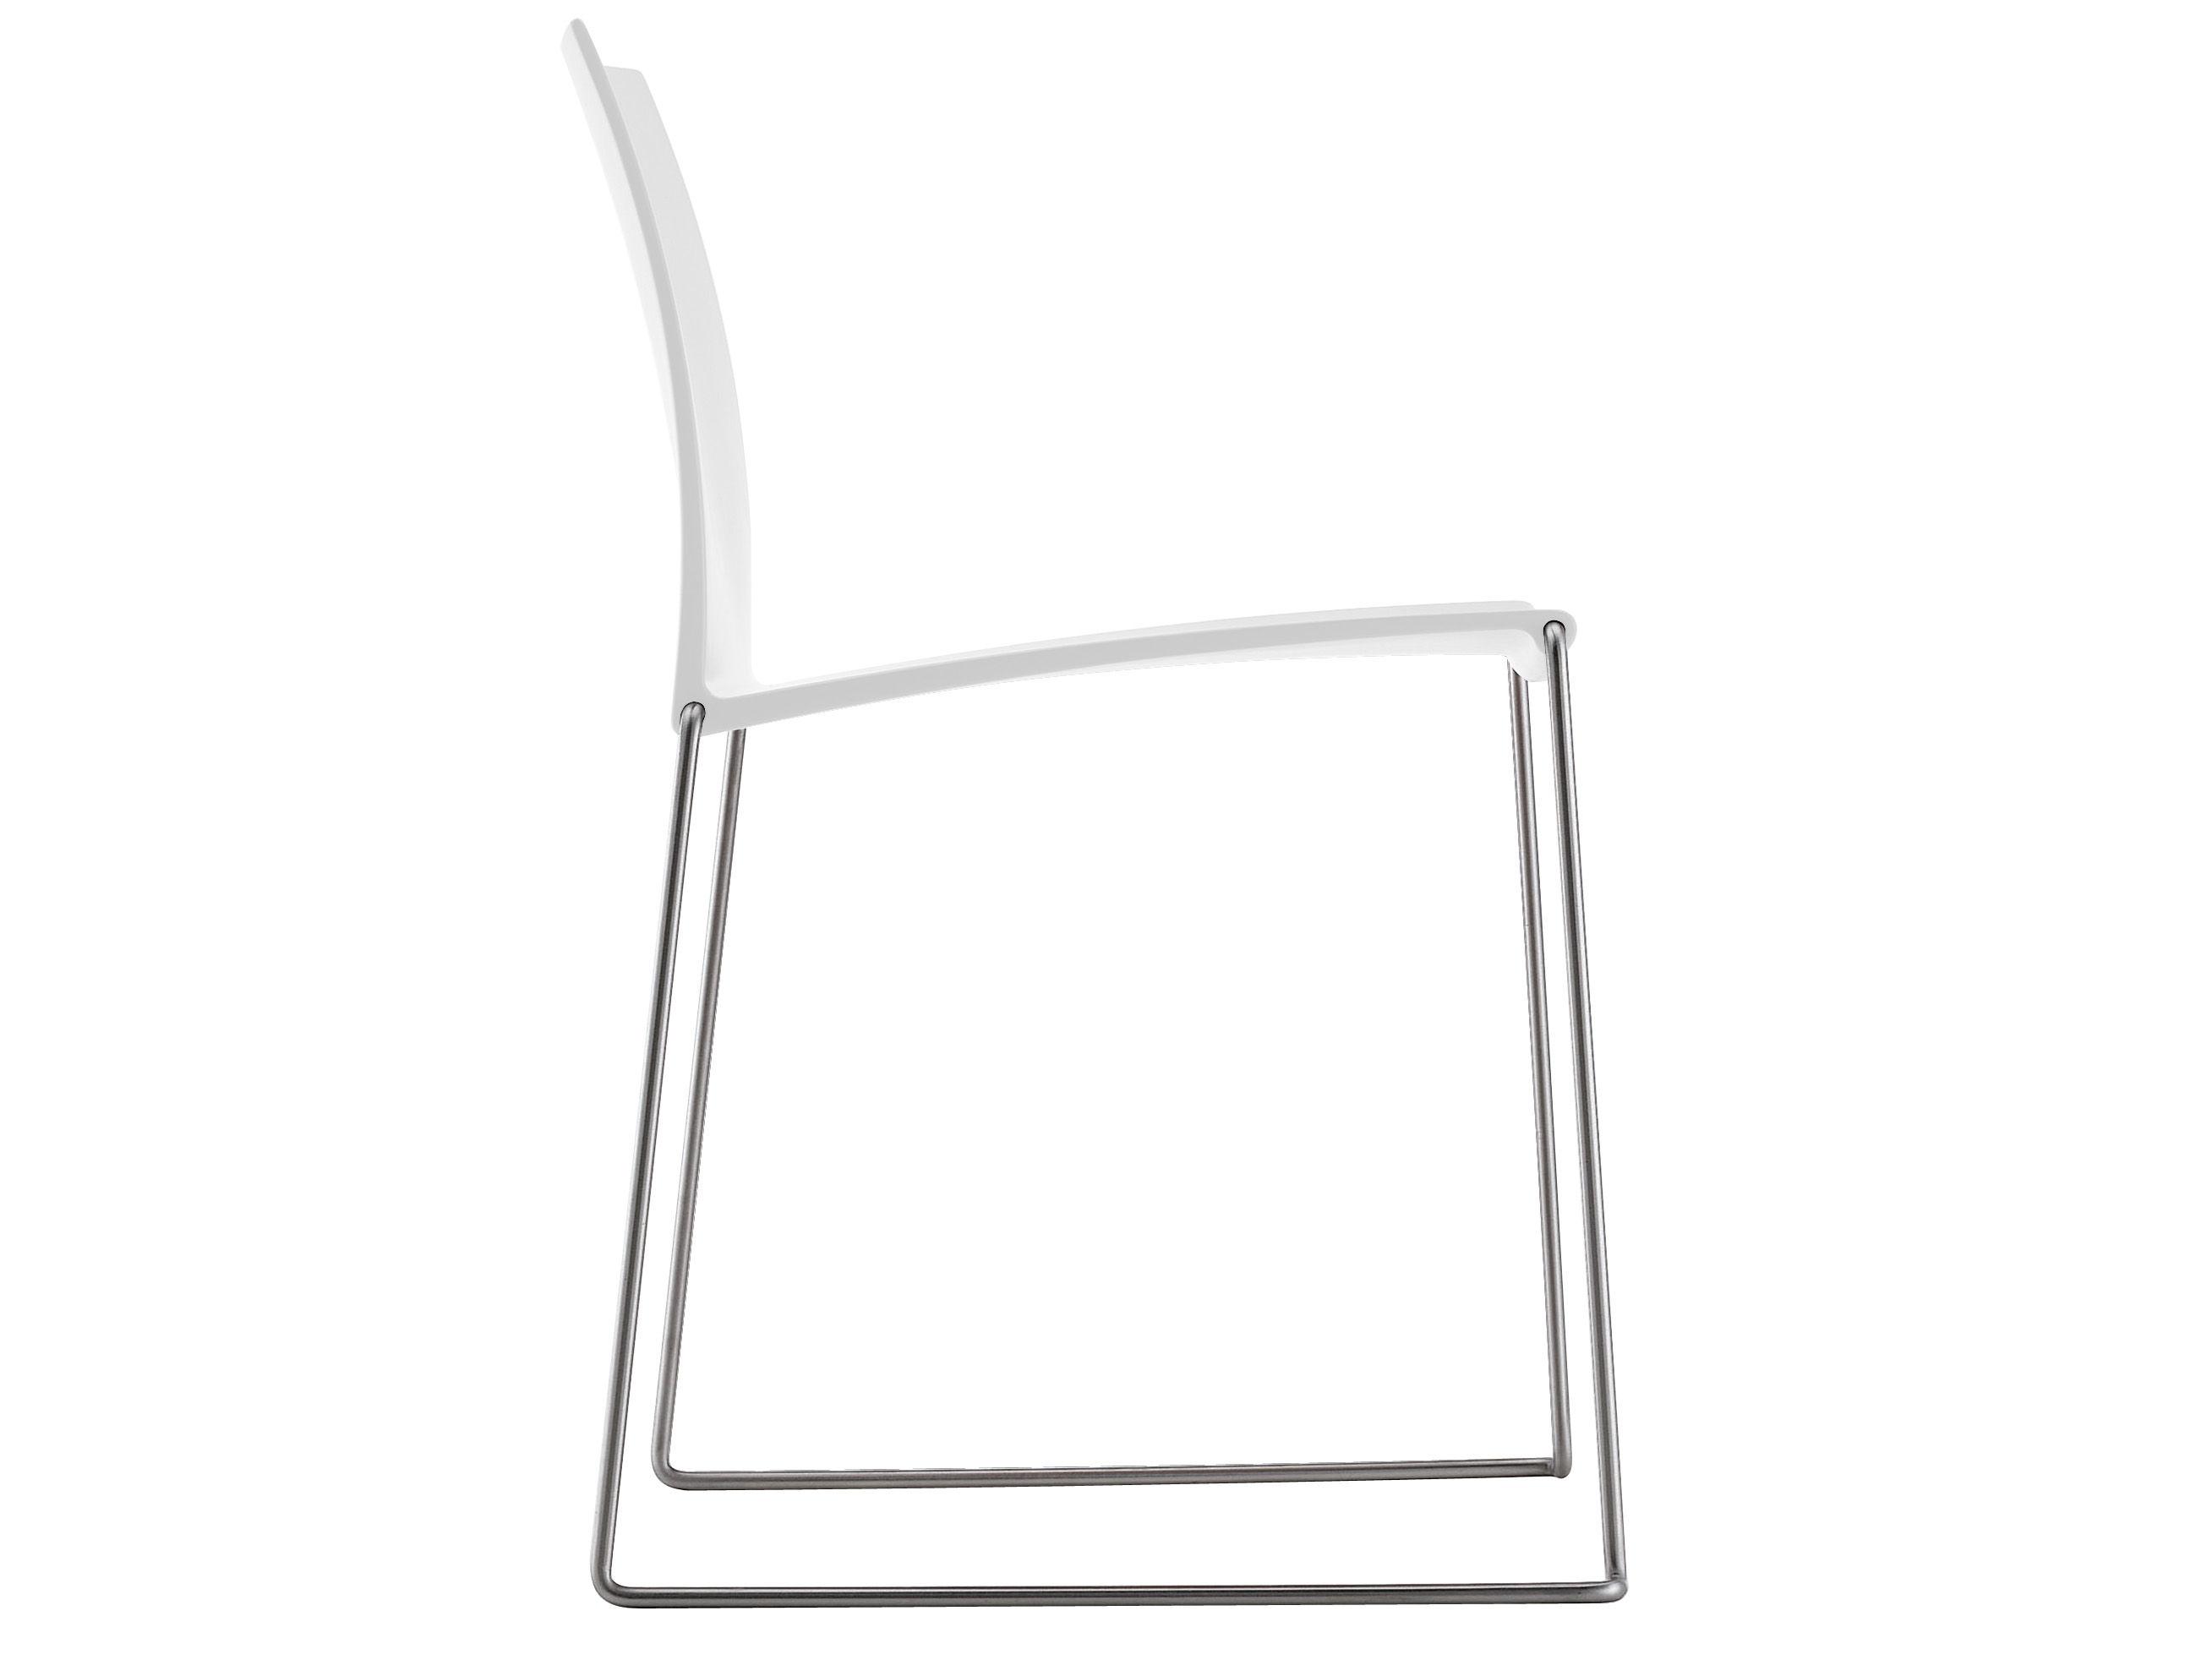 Möbel - Stühle  - M1 Stapelbarer Stuhl - MDF Italia - Weiß - Gestell aus Edelstahl - rostfreier Stahl